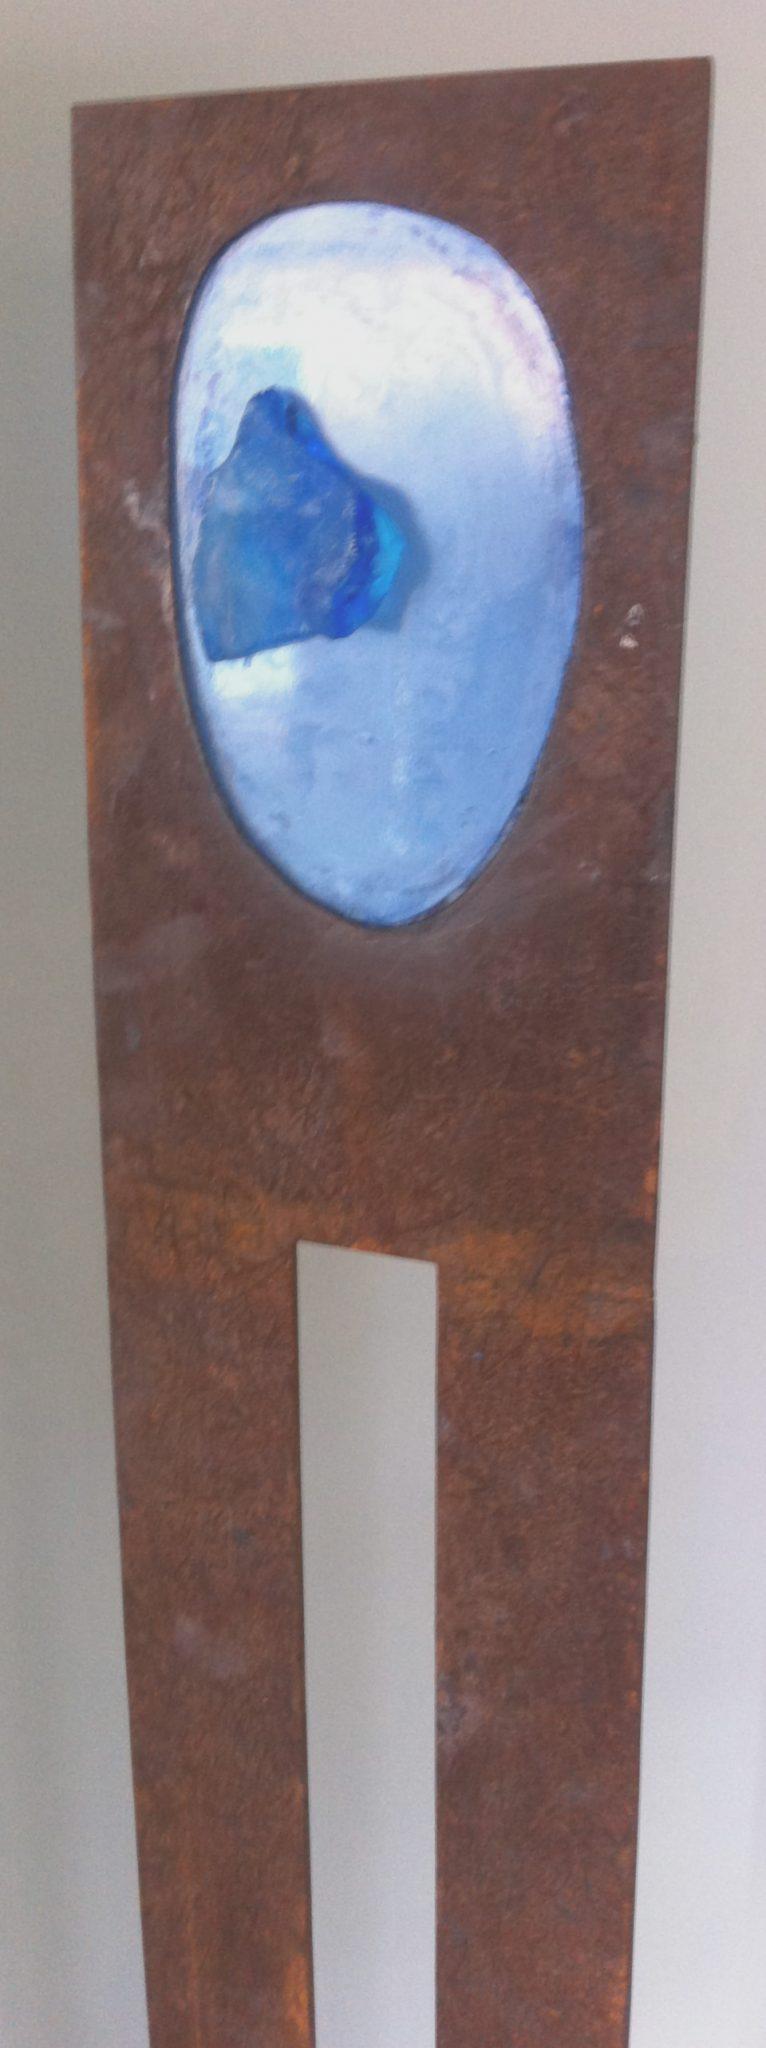 Blauw blood - Glass+Steel